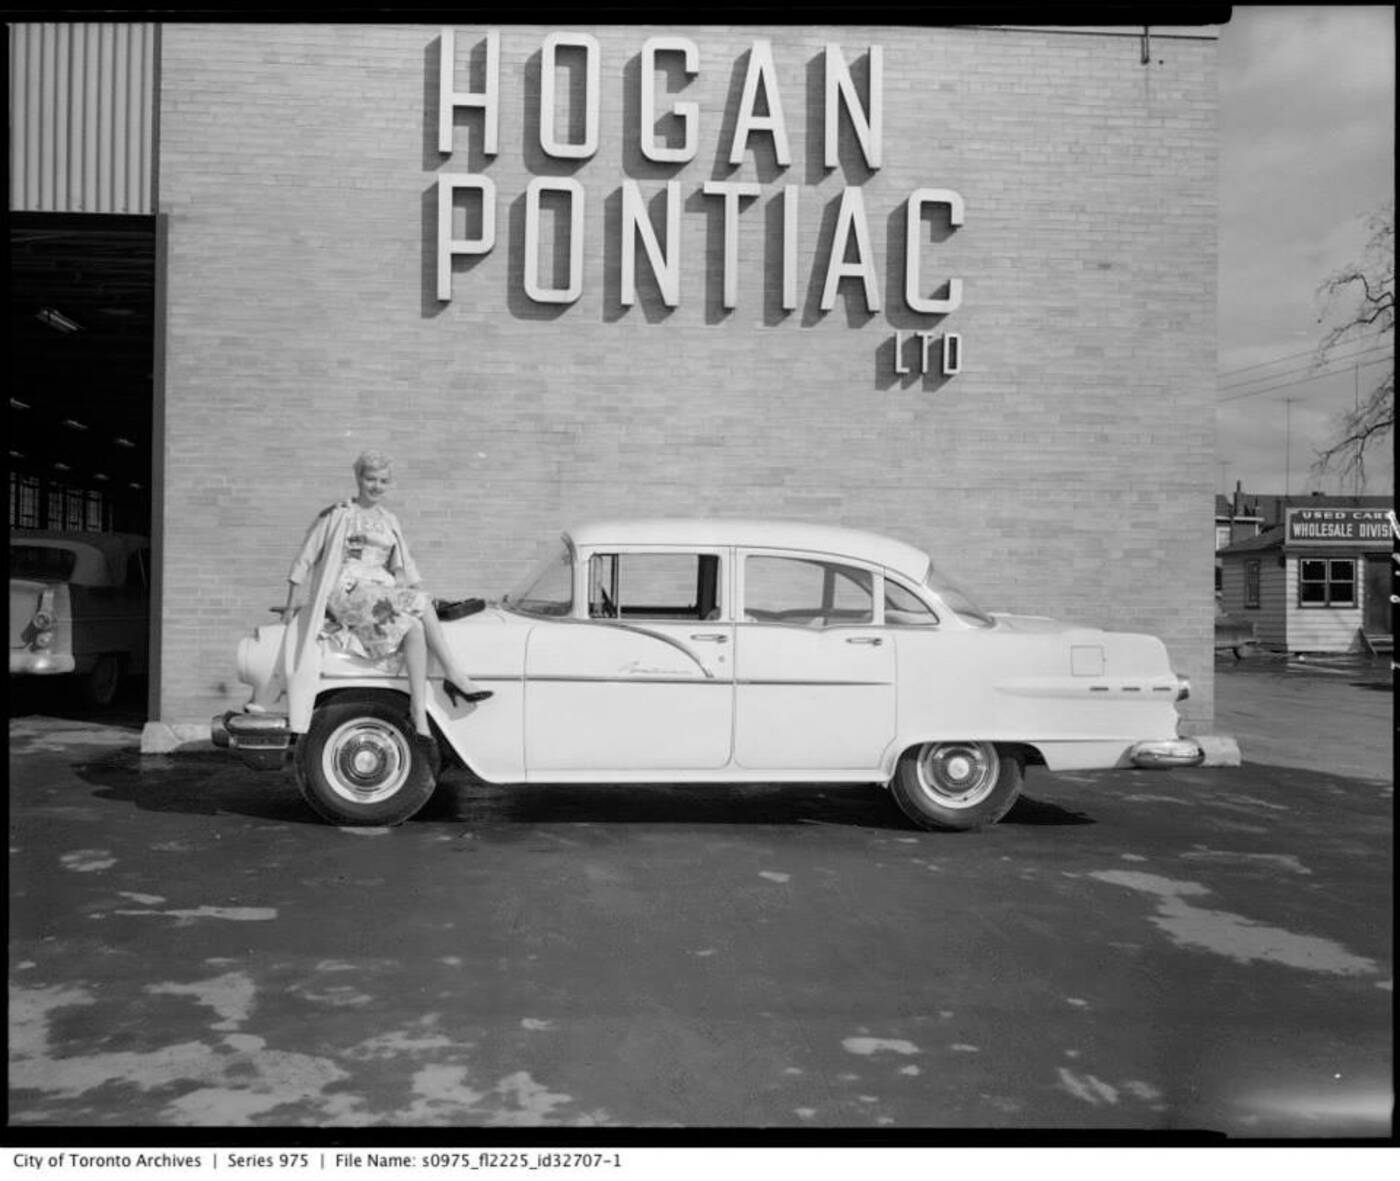 Vintage Pontiac Dealership